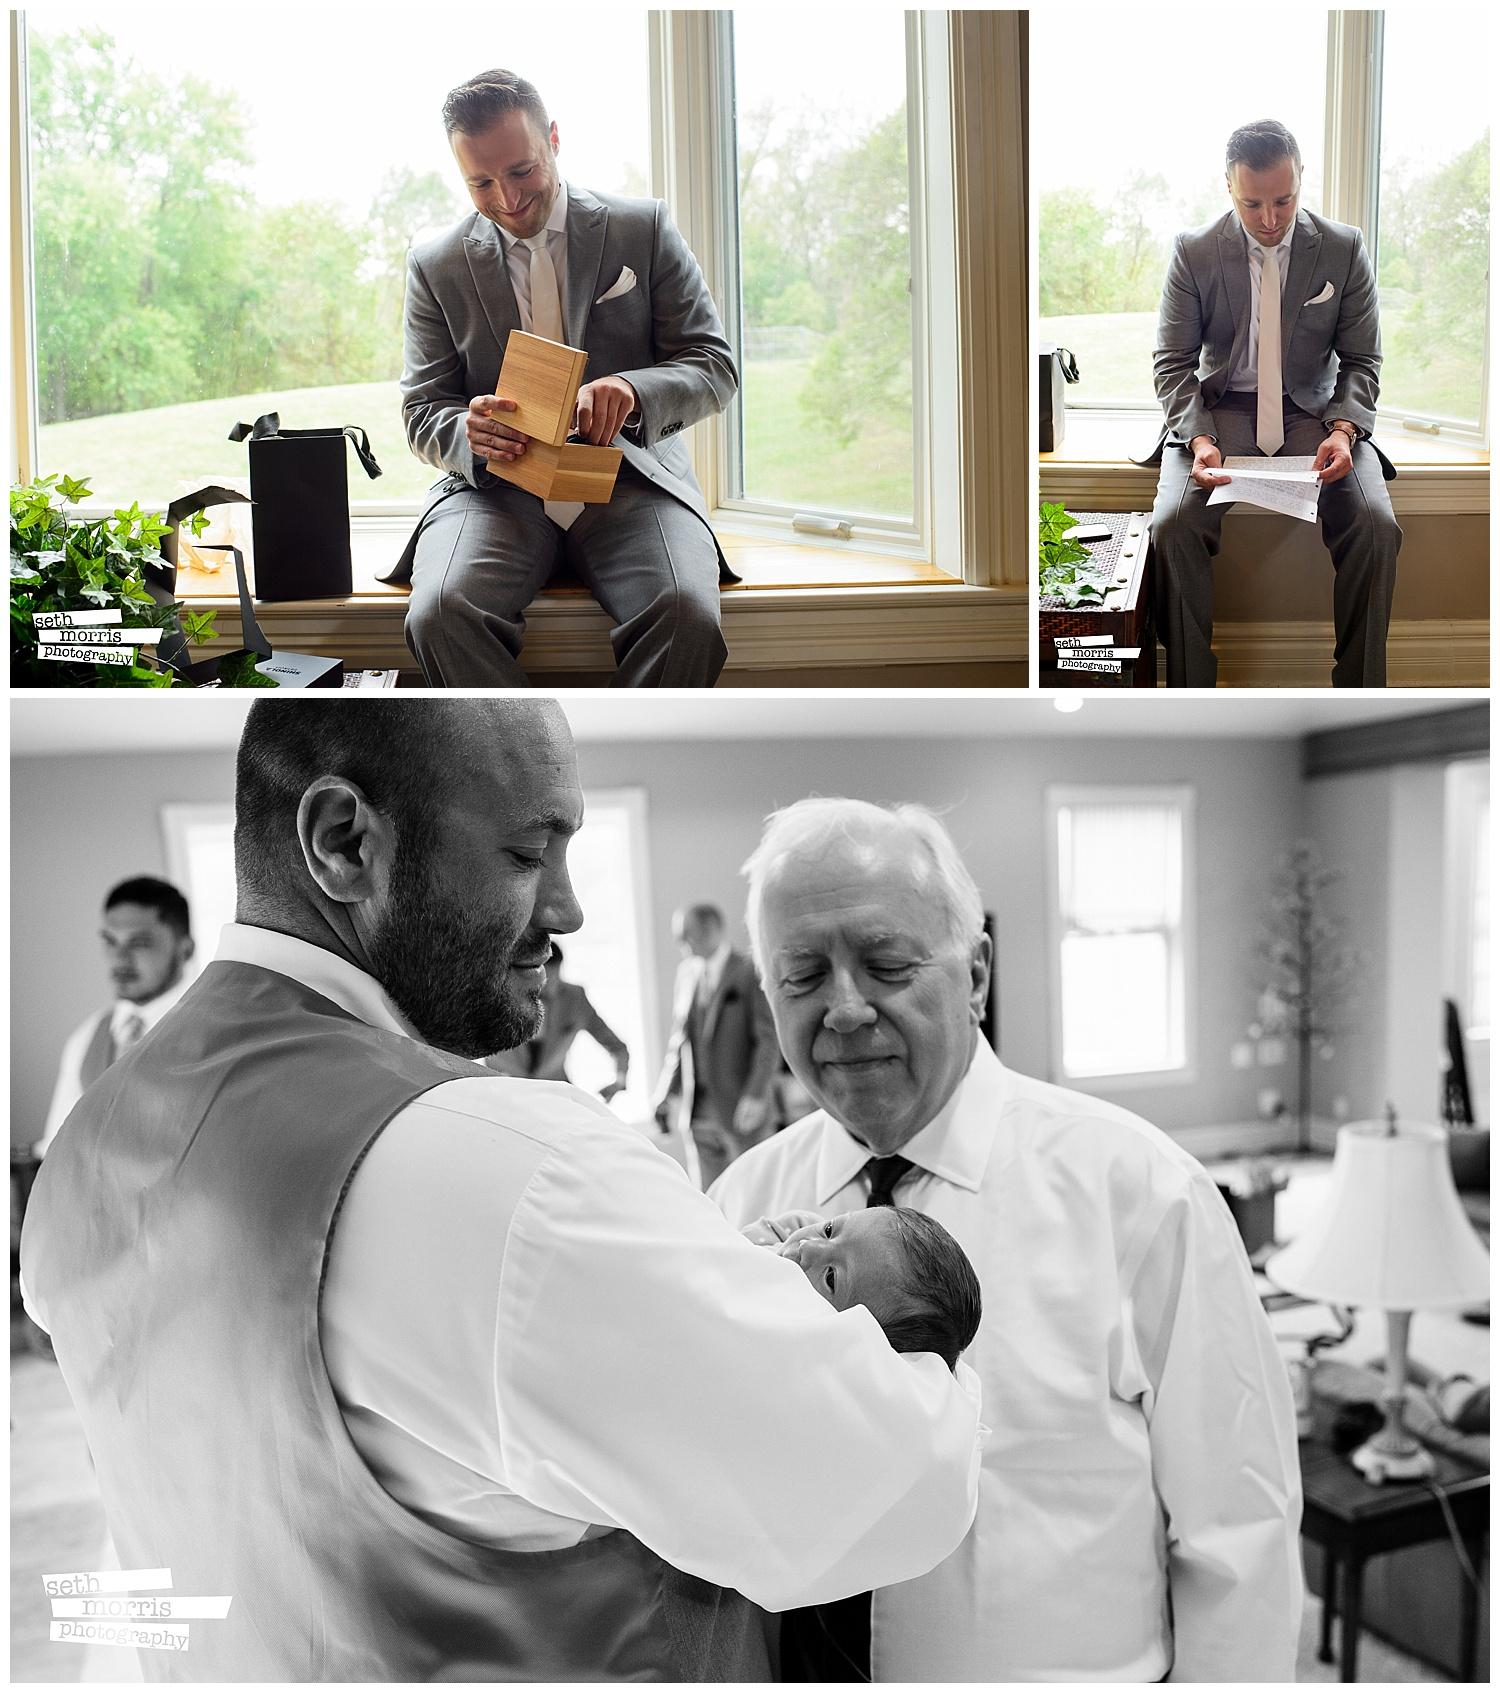 ottawa-tent-wedding-reception-rainy wedding-pictures-6.jpg